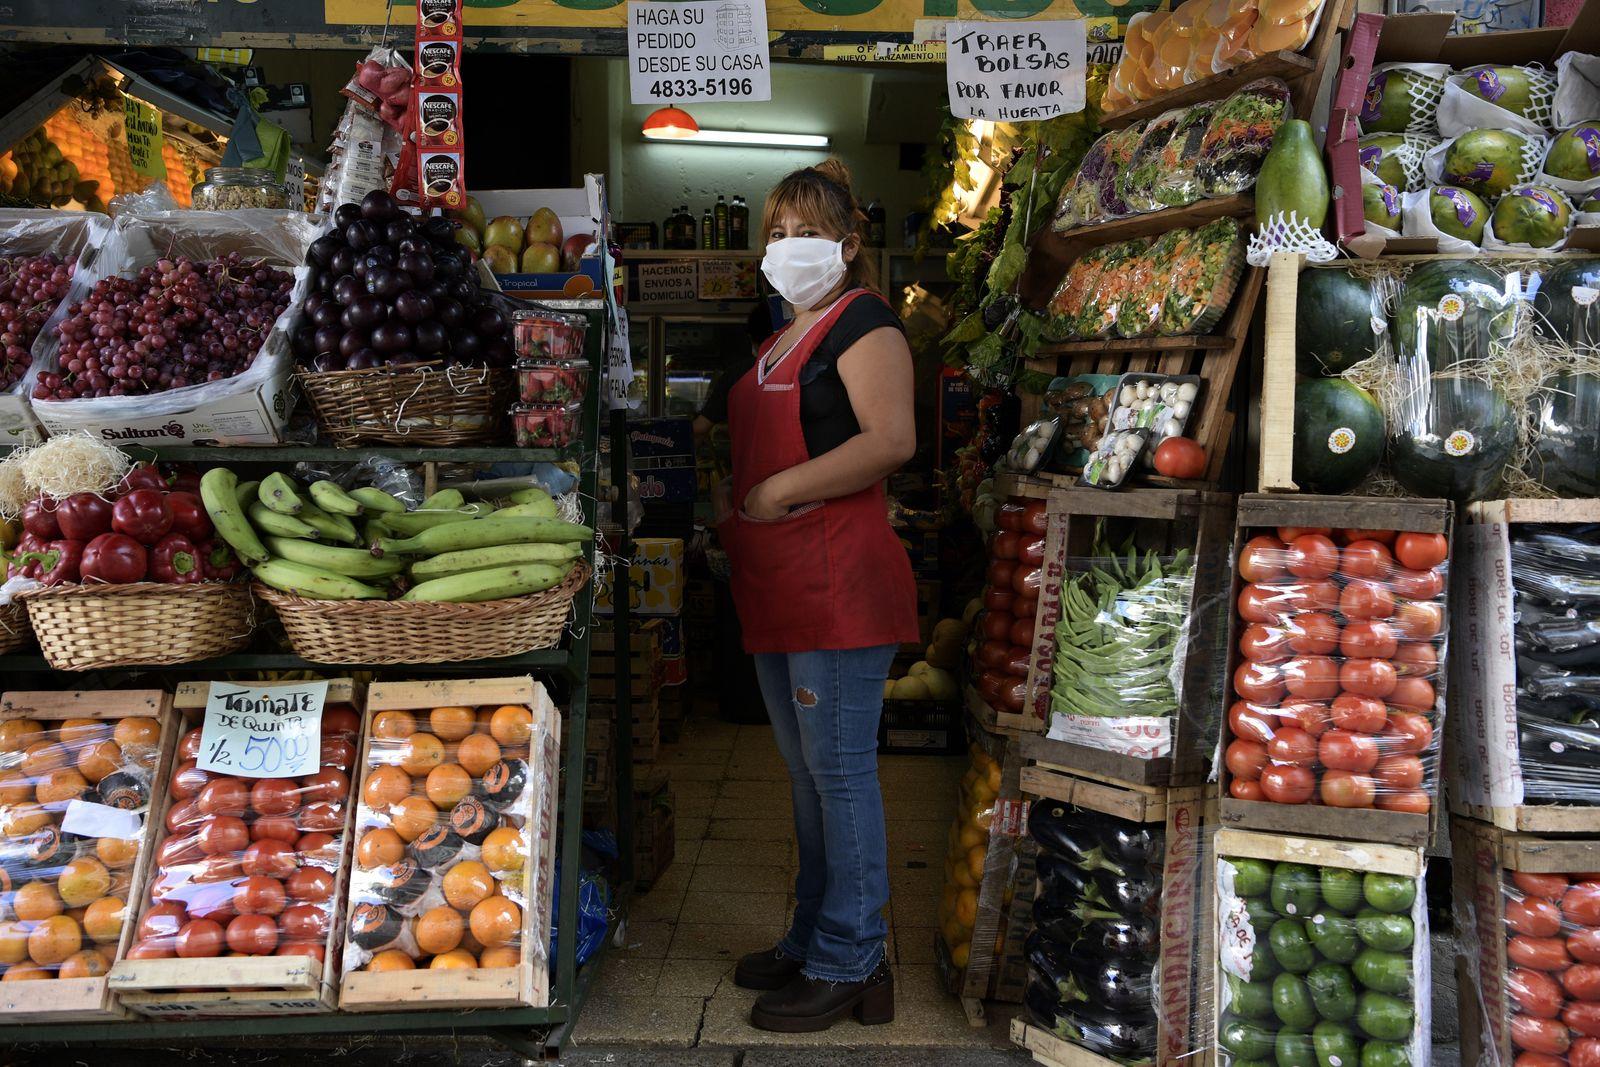 ARGENTINA-HEALTH-VIRUS-MAYDAY-PHOTO ESSAY